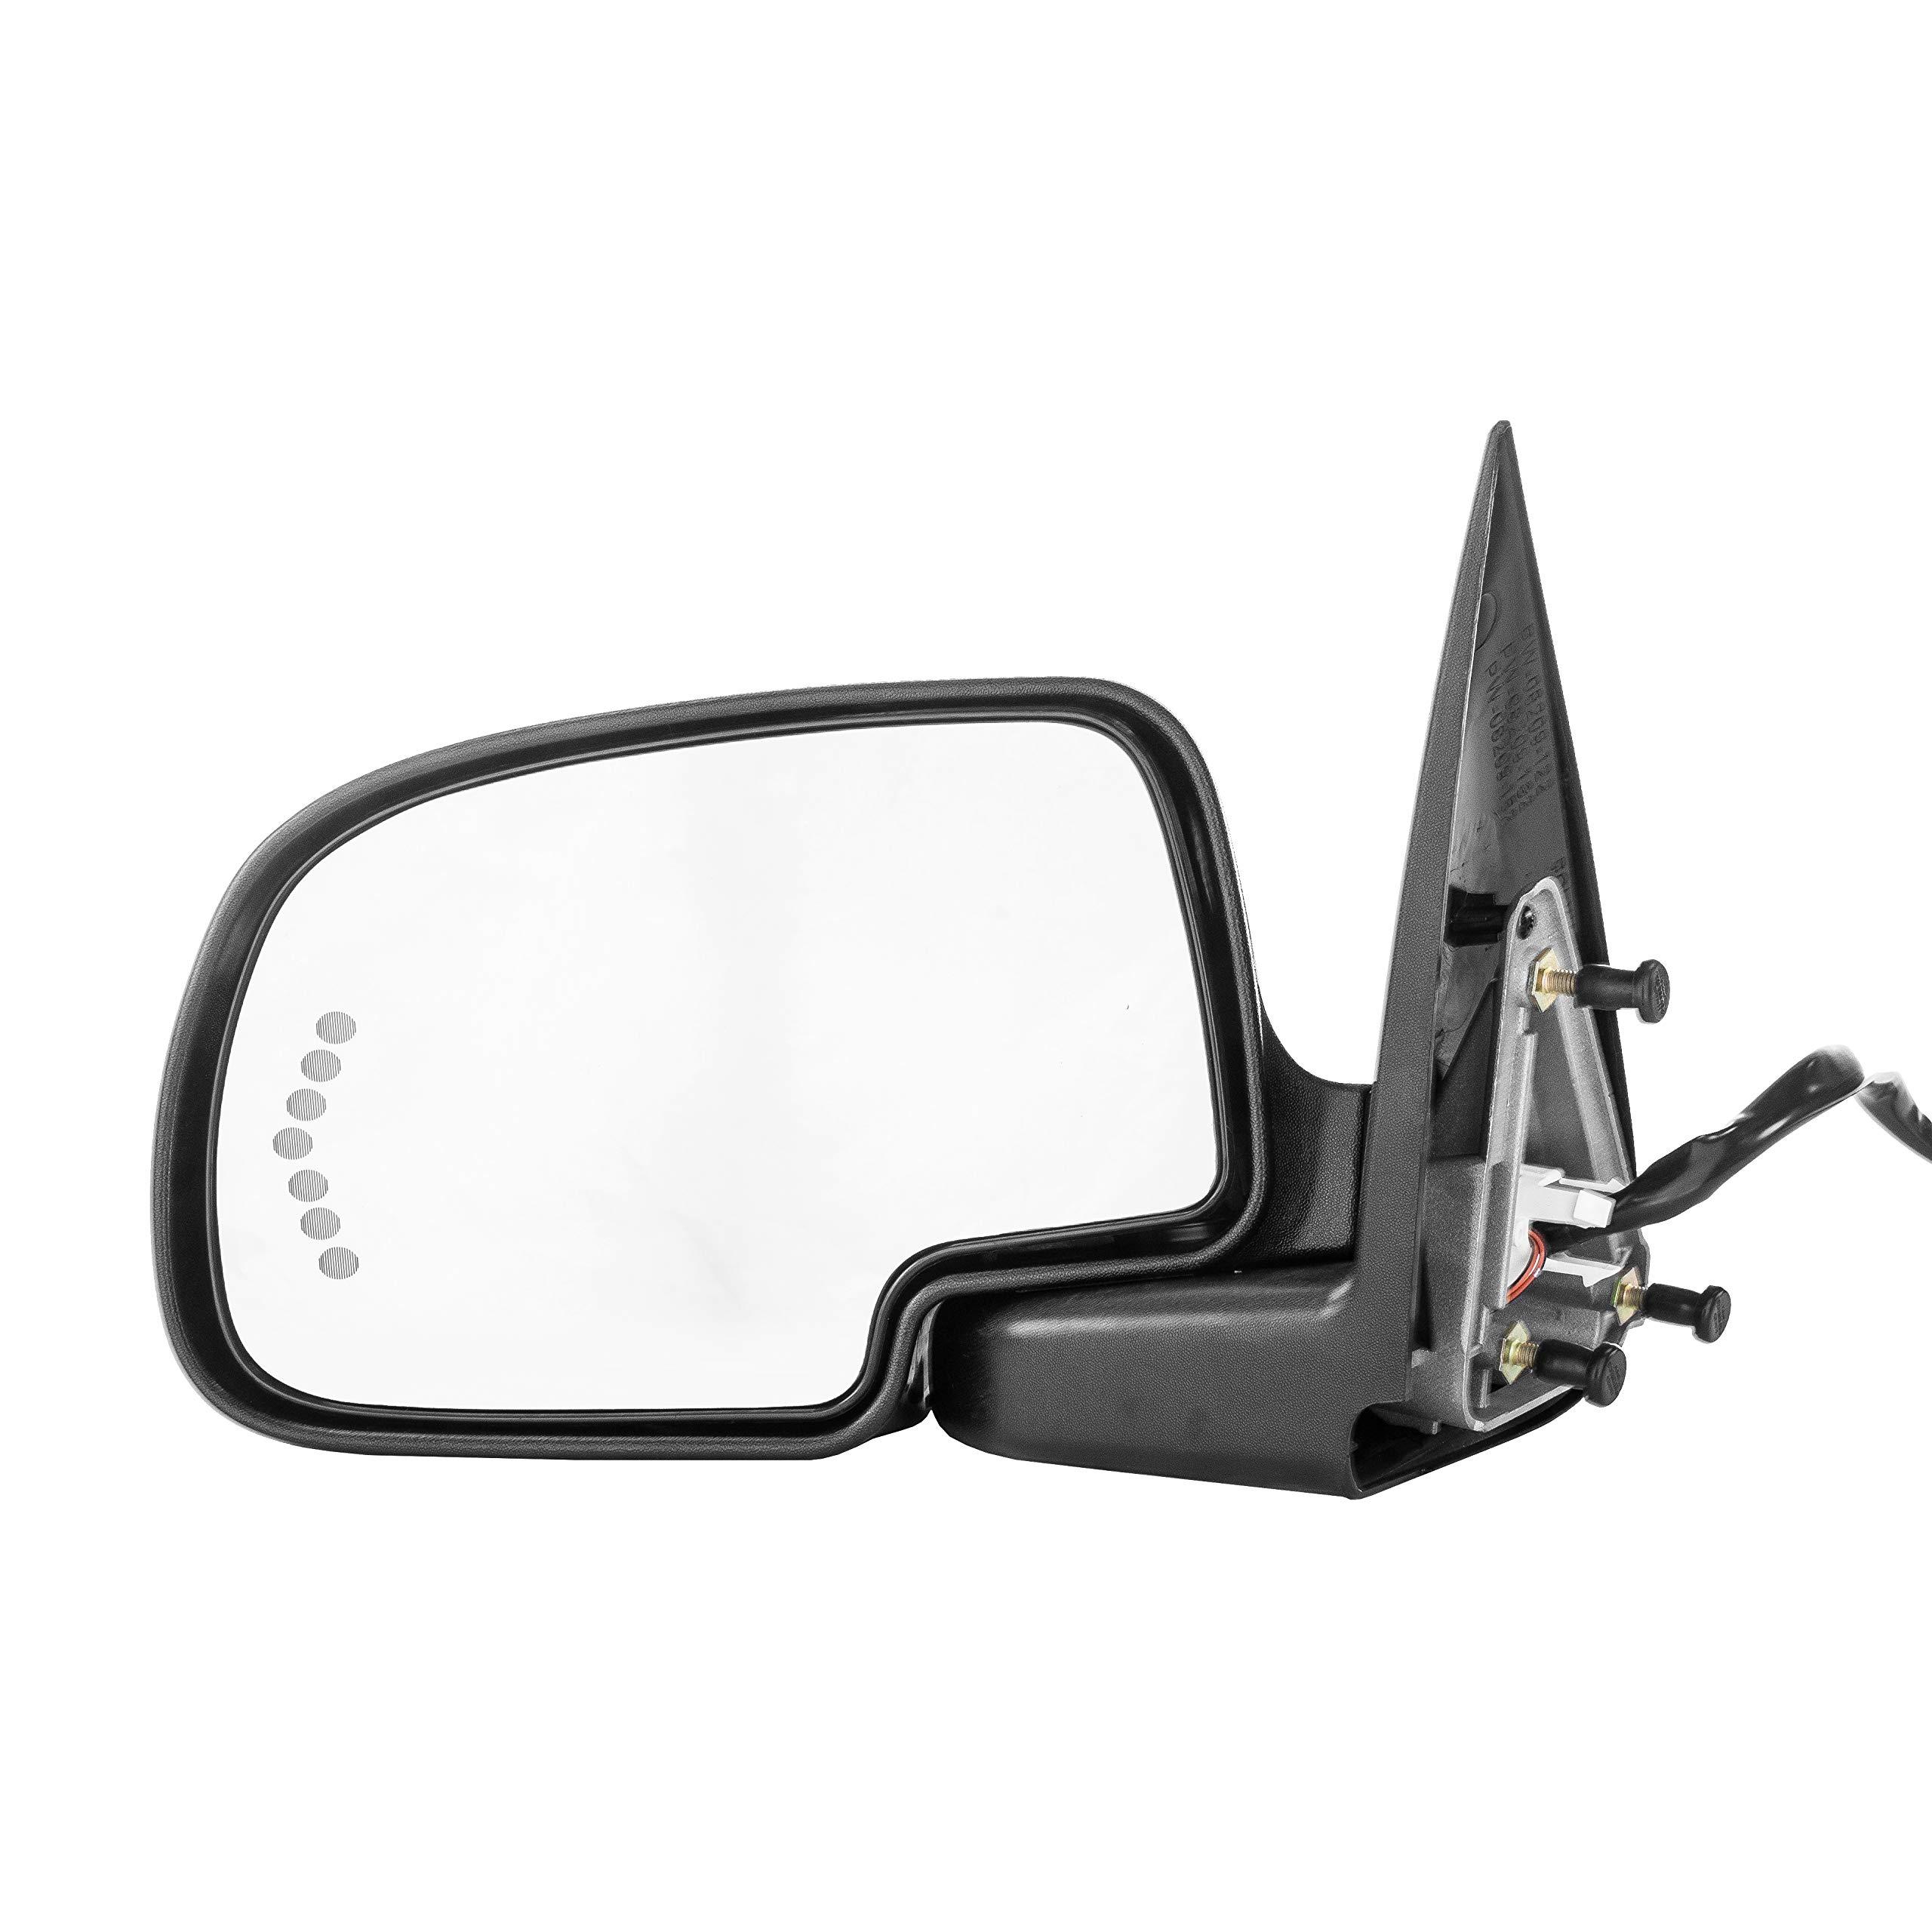 2000-2006 Chevy Suburban 1500 2500 Passenger Side Power Heated Folding Mirror